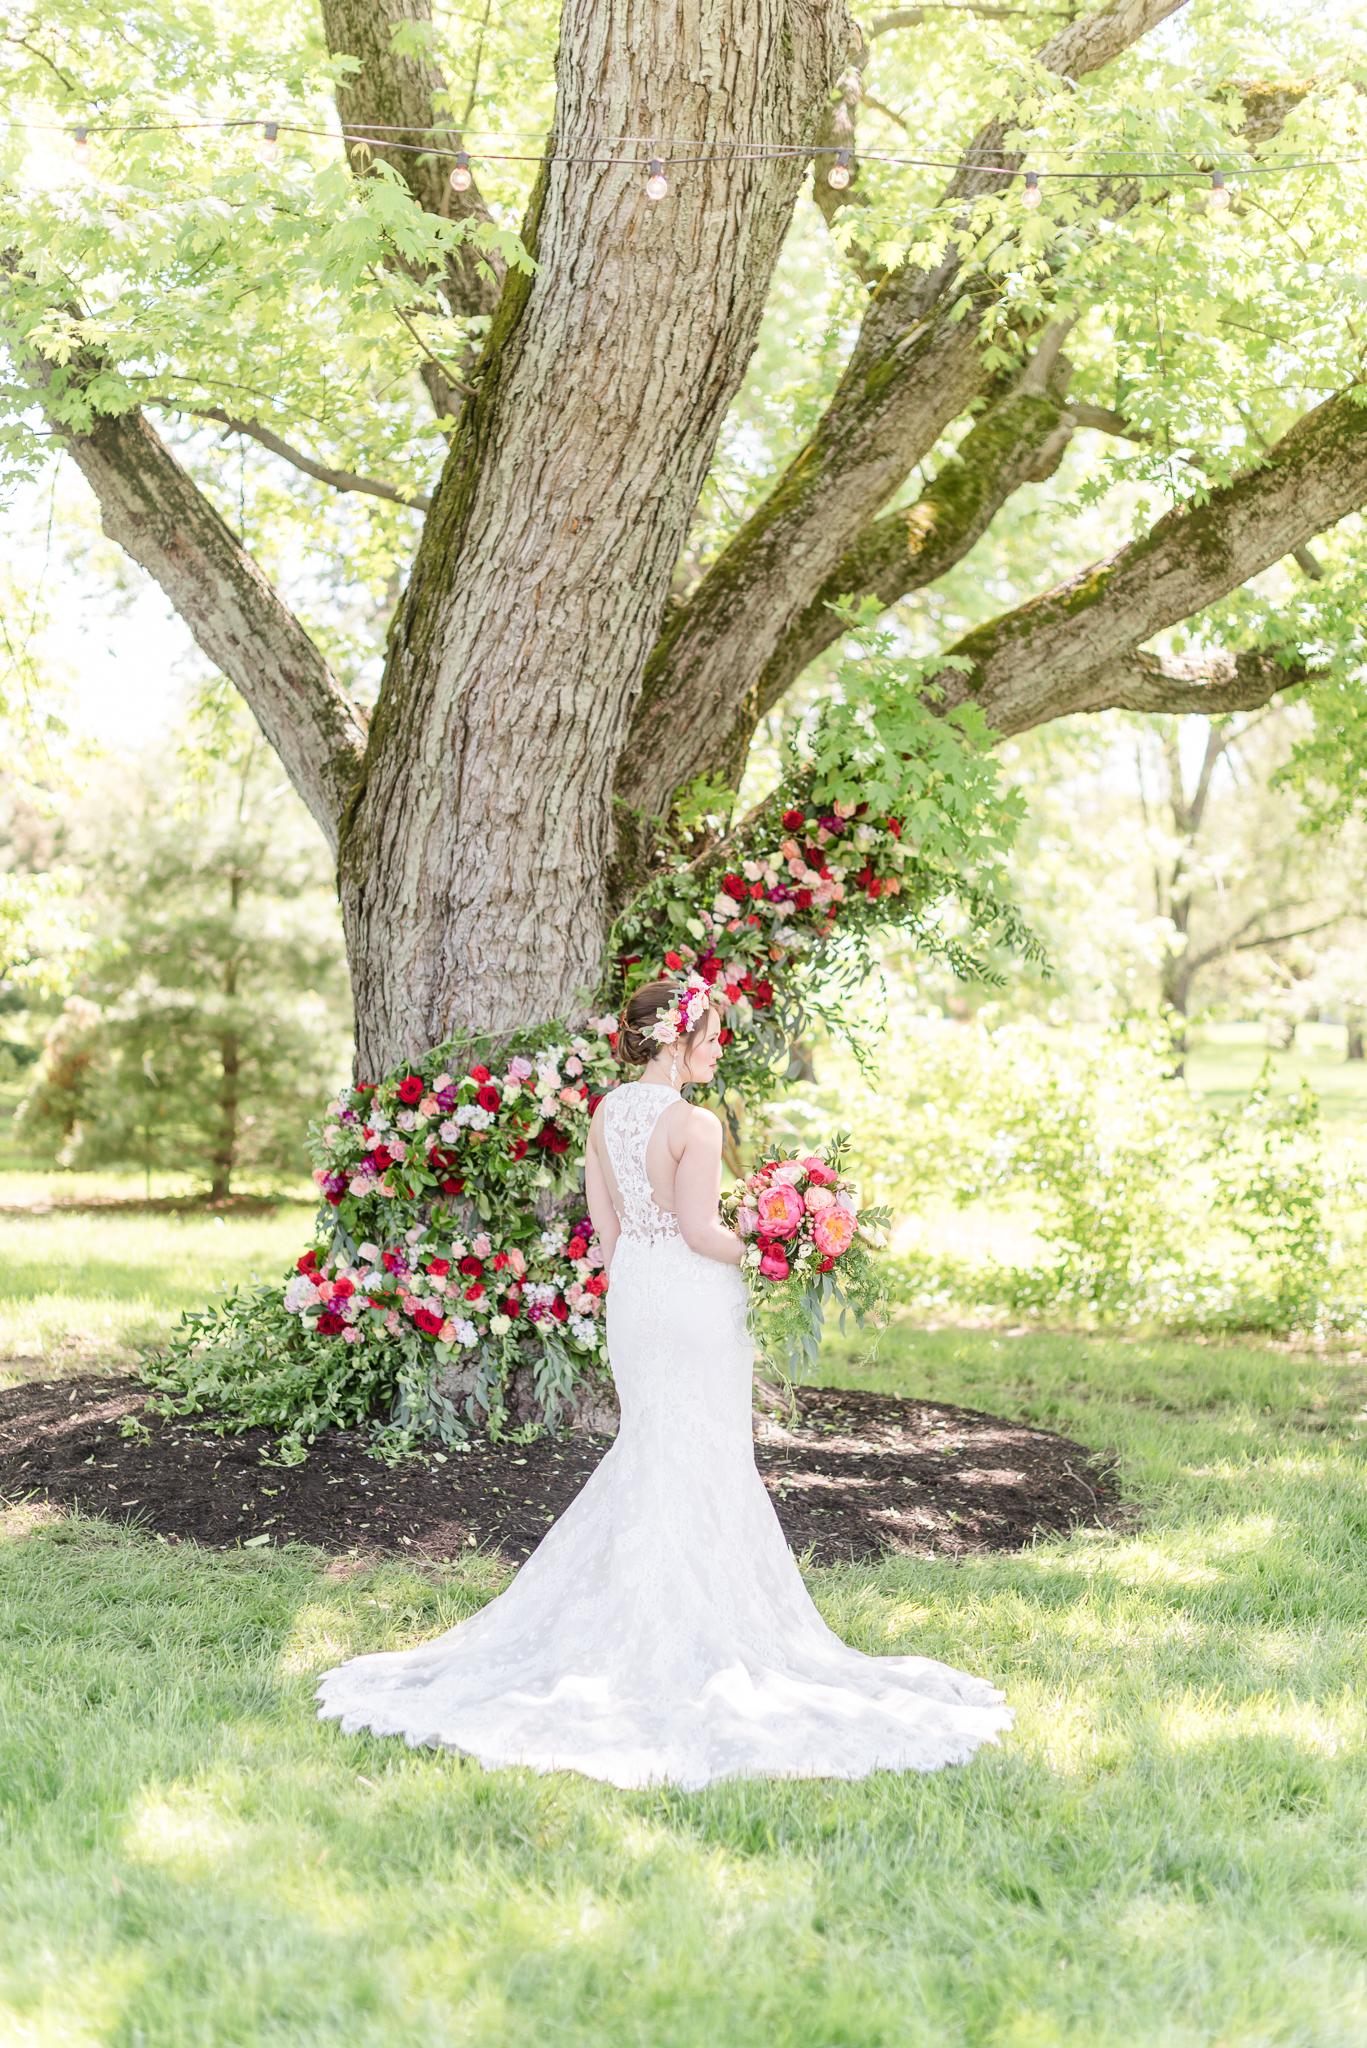 Mustard Seed Gardens Wedding Indianapolis Noblesvile Fishers Wedding Photographer-53.jpg